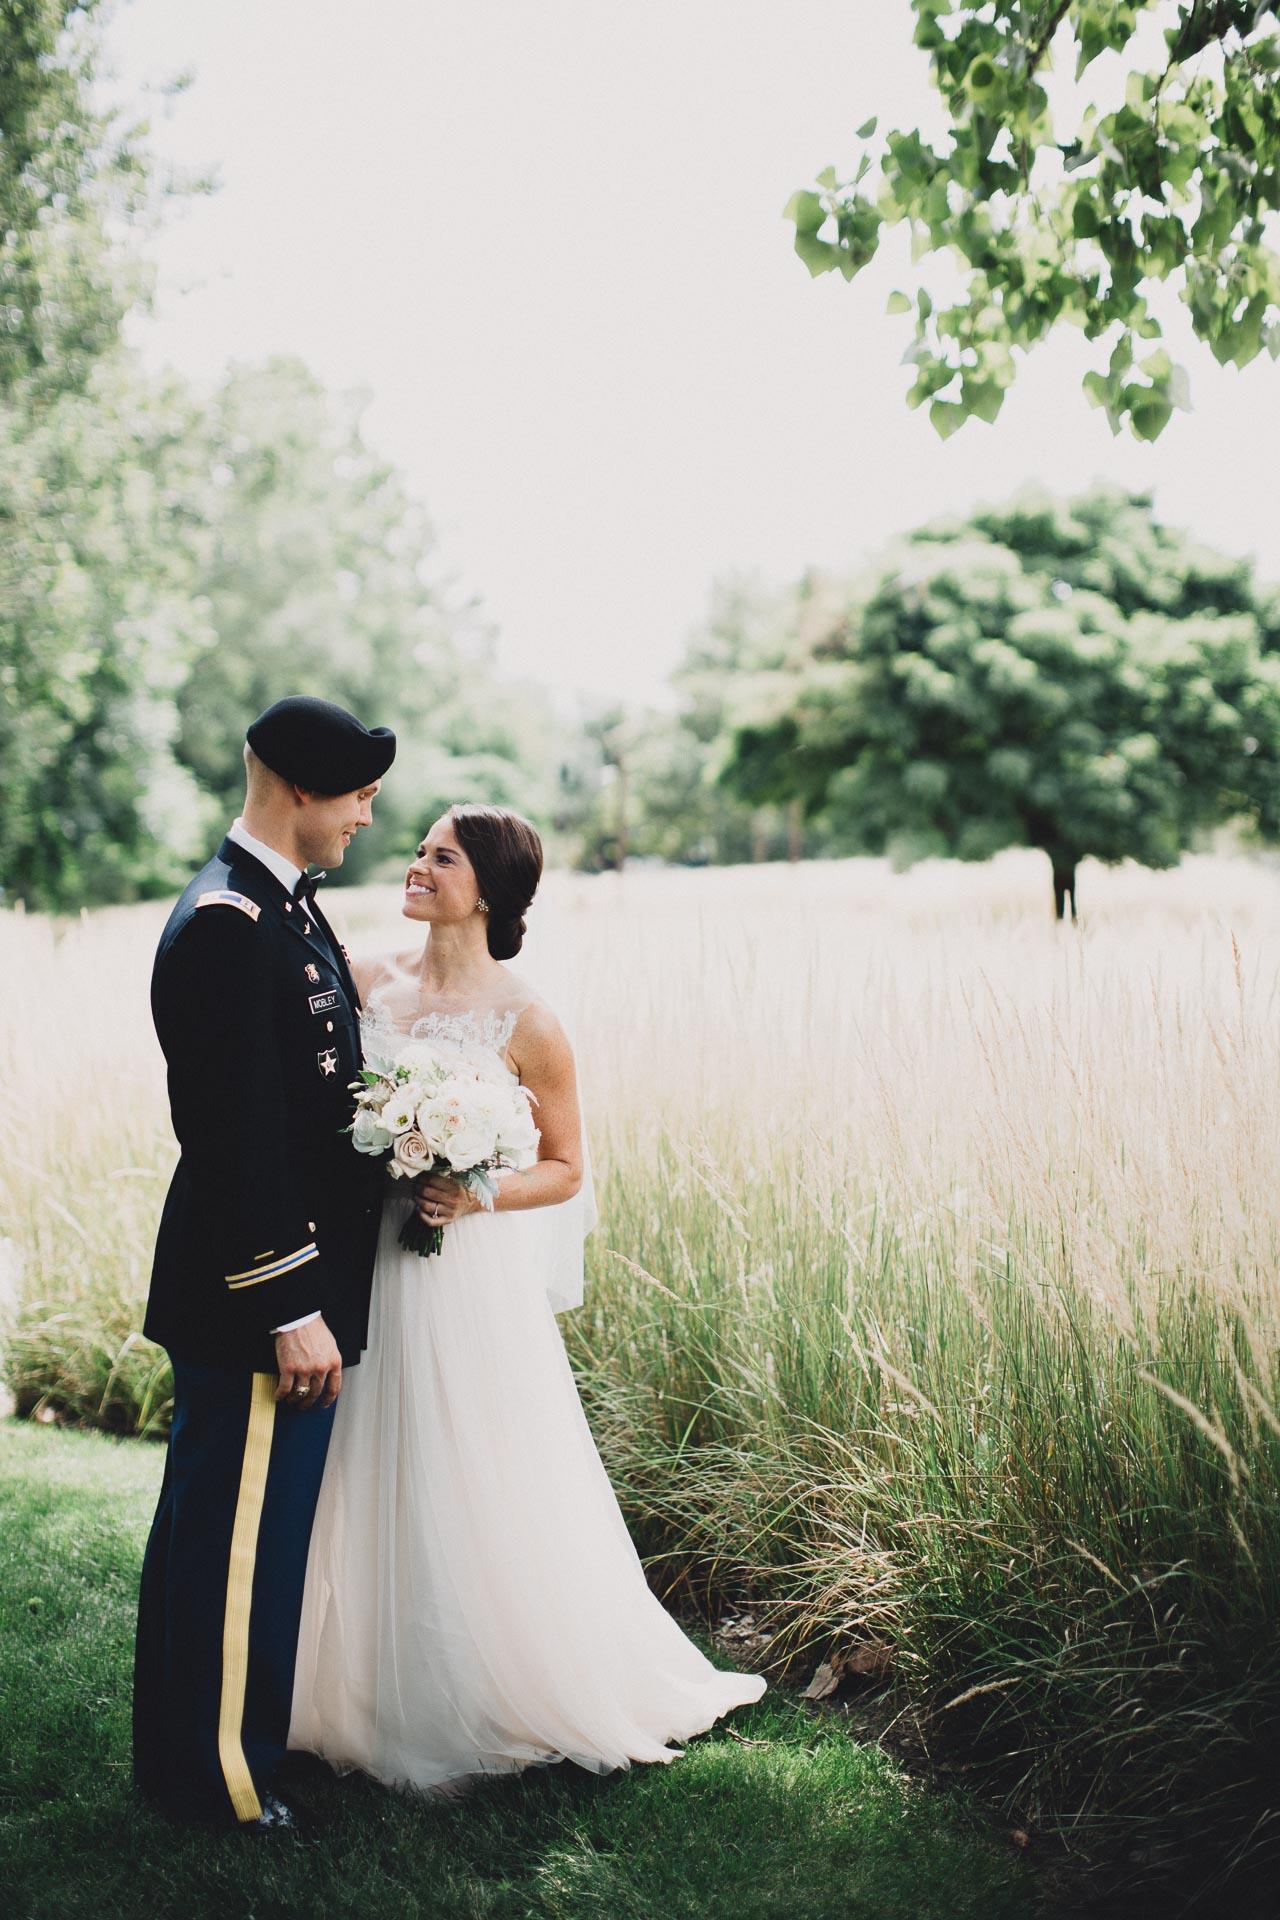 Emily-Eddie-Cincinnati-Rennaissance-Hotel-Wedding-048@2x.jpg